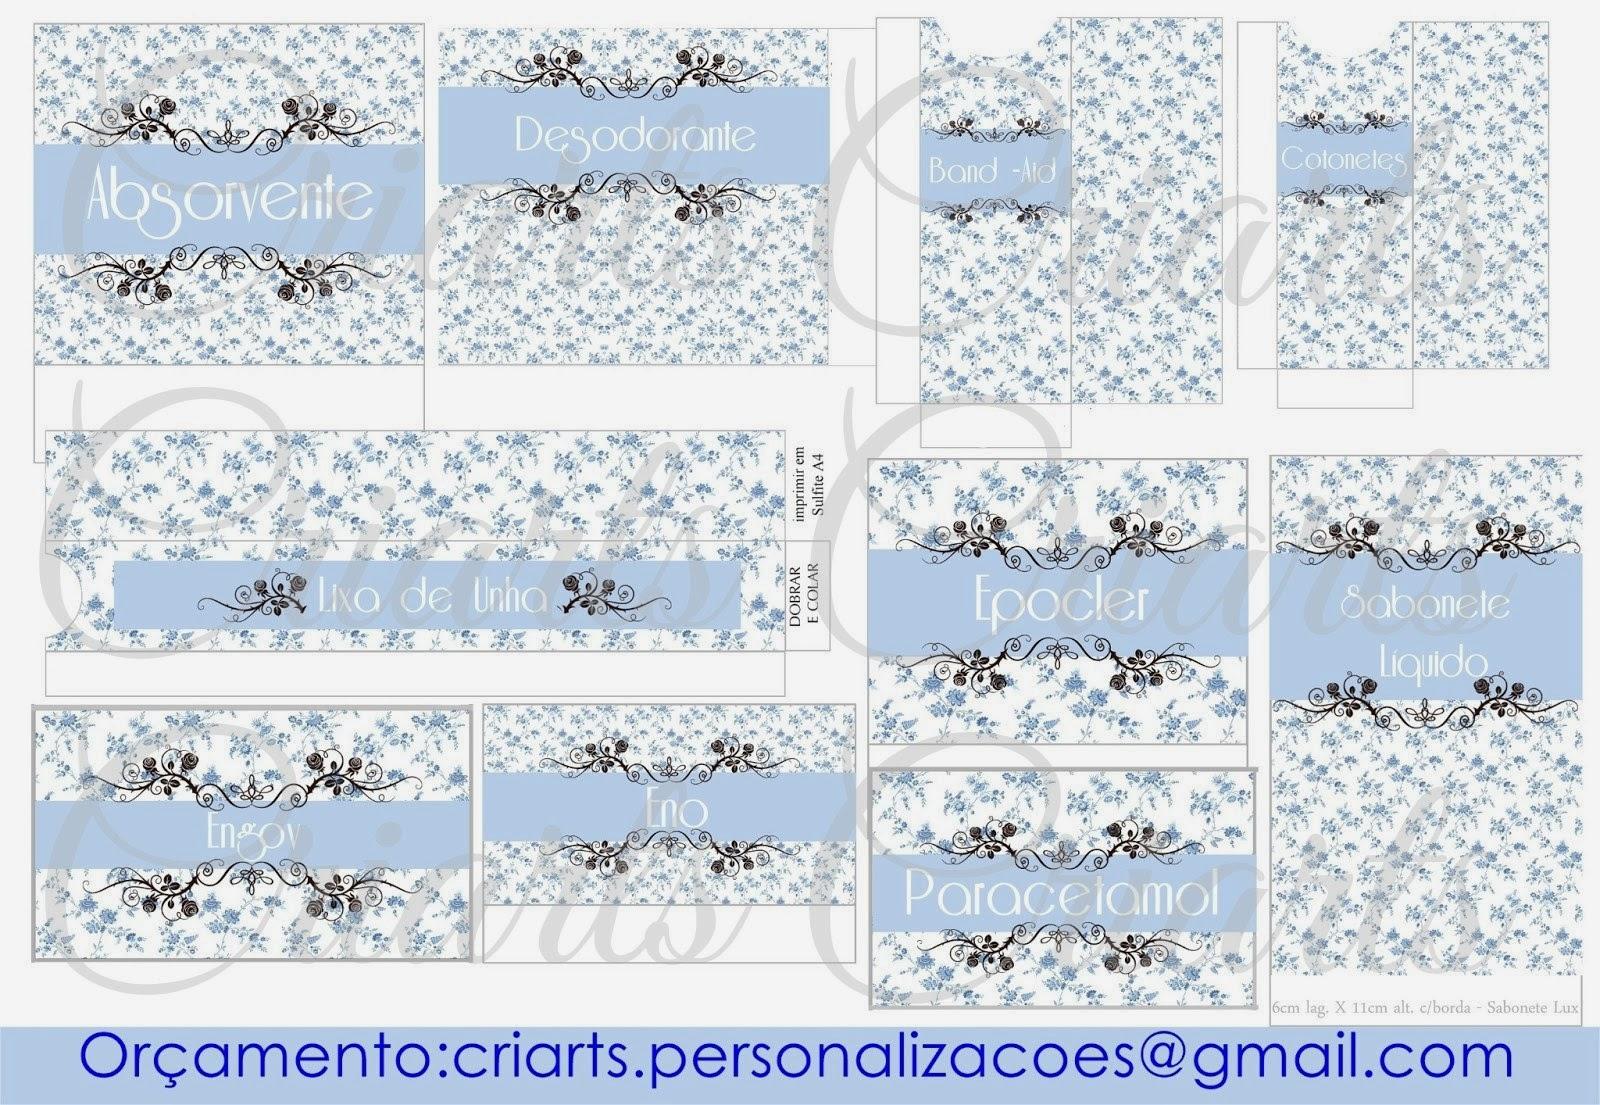 Kit Banheiro Tifany : Criarts personaliza?es kit banheiro azul